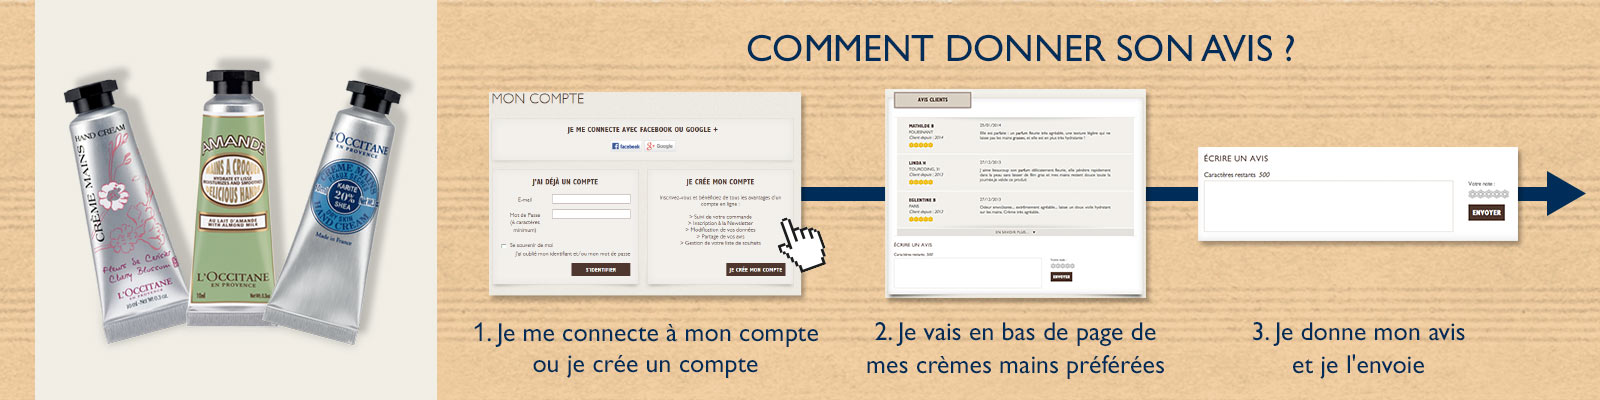 Offre Facebook Avis - L'Occitane France